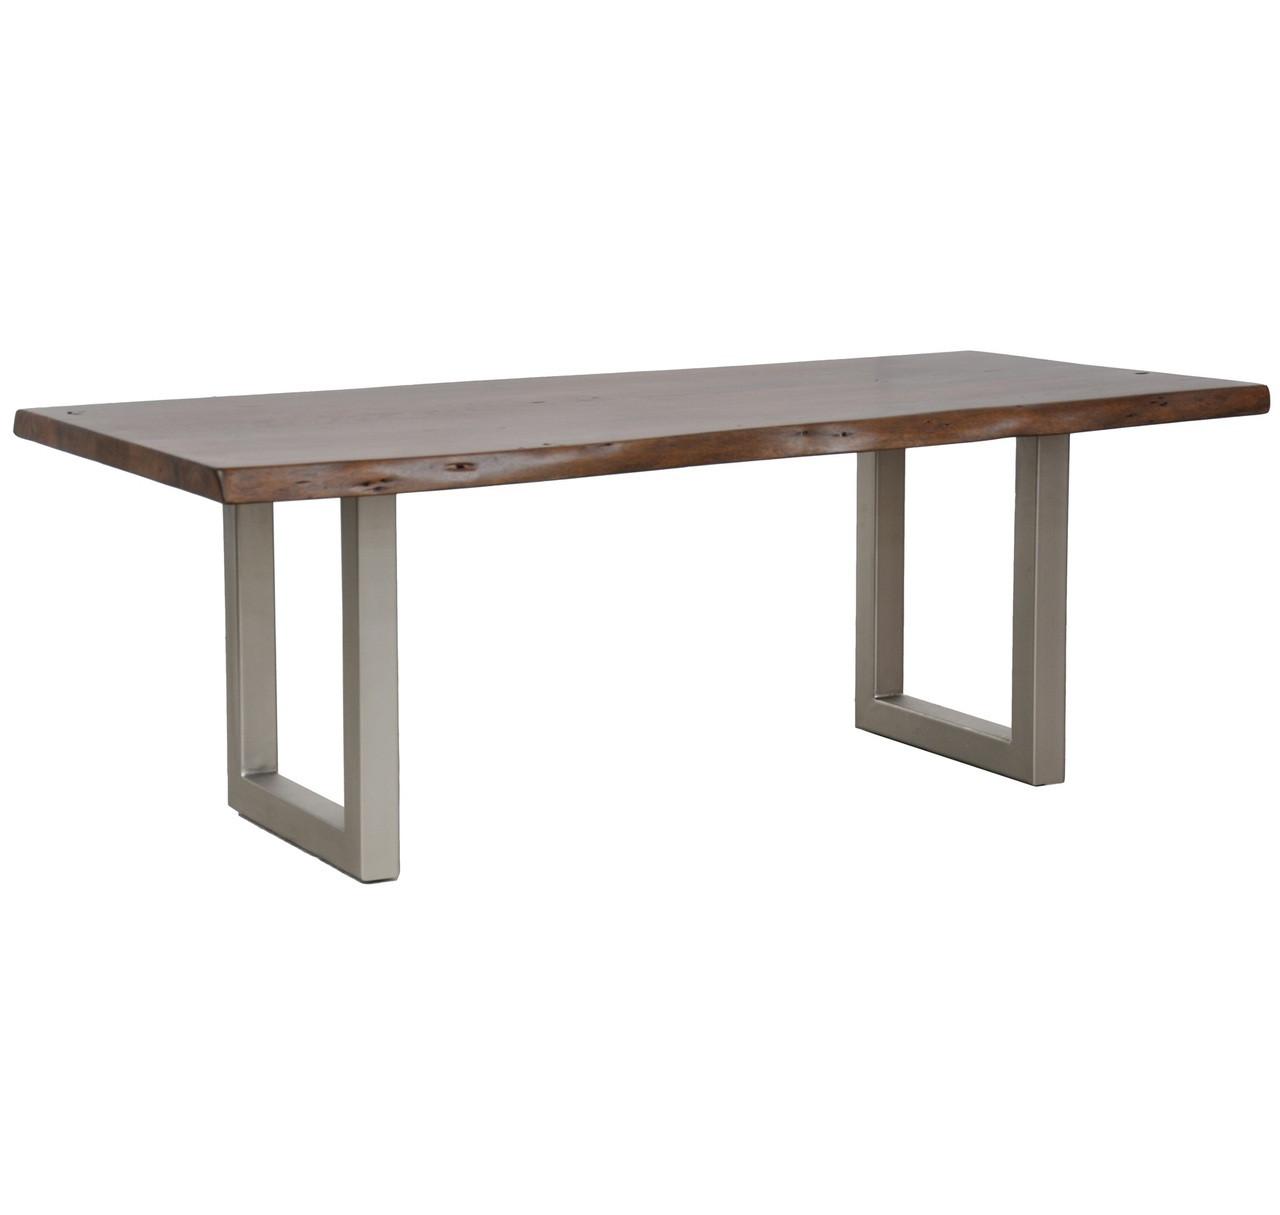 wood metal dining table. Montana Solid Wood Metal Leg Dining Table 94\